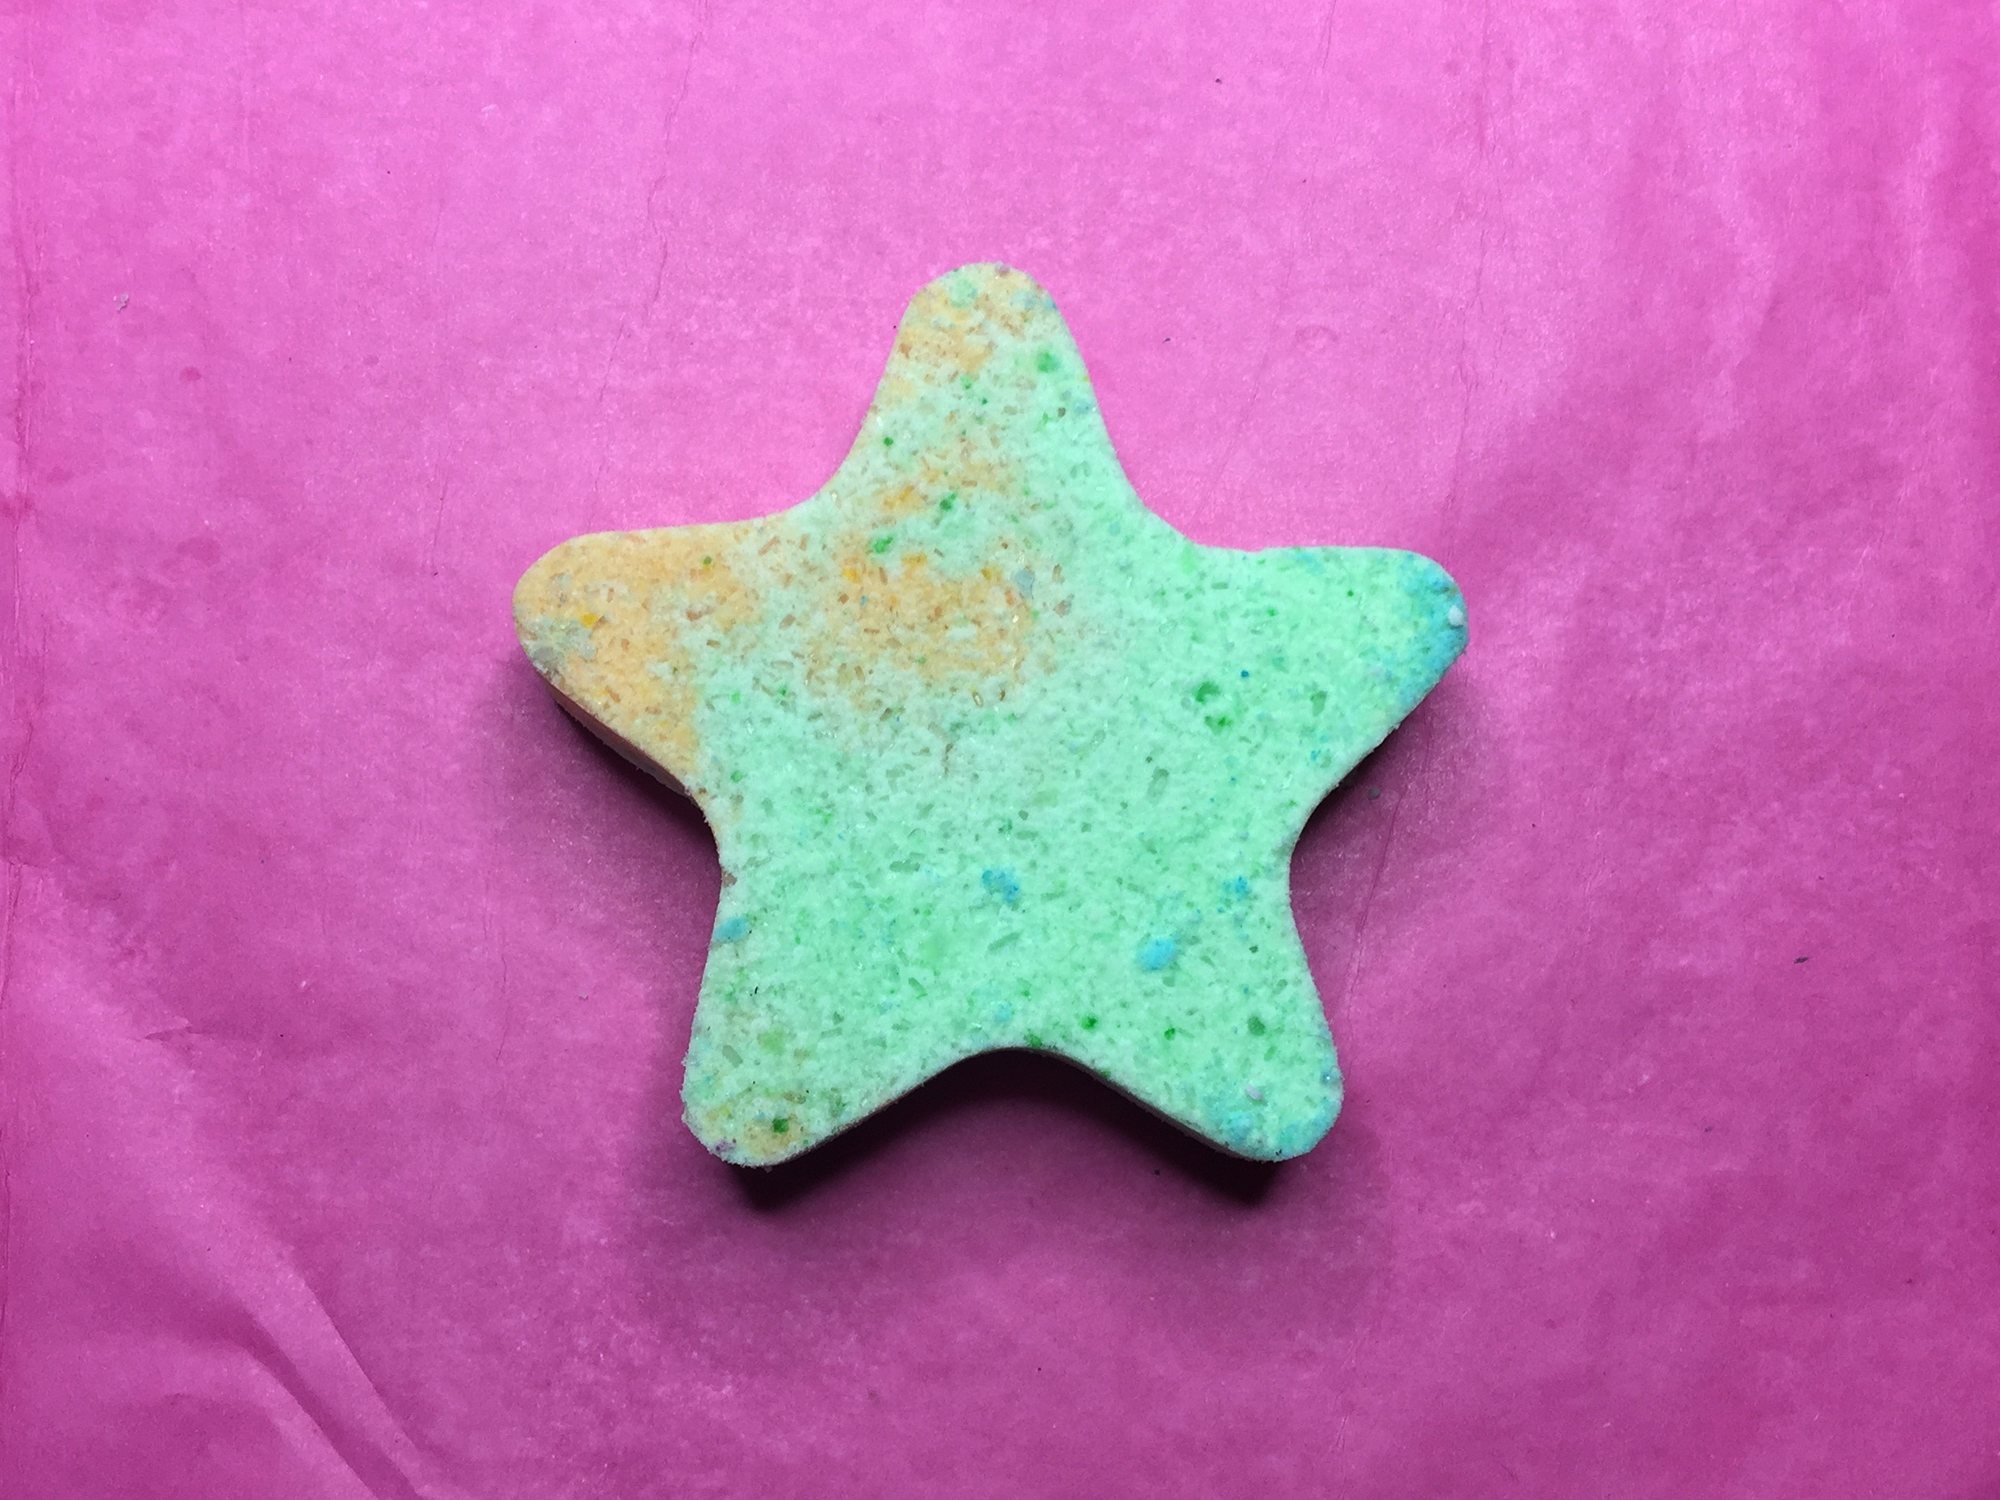 Star_Cookie_Cutter.jpg